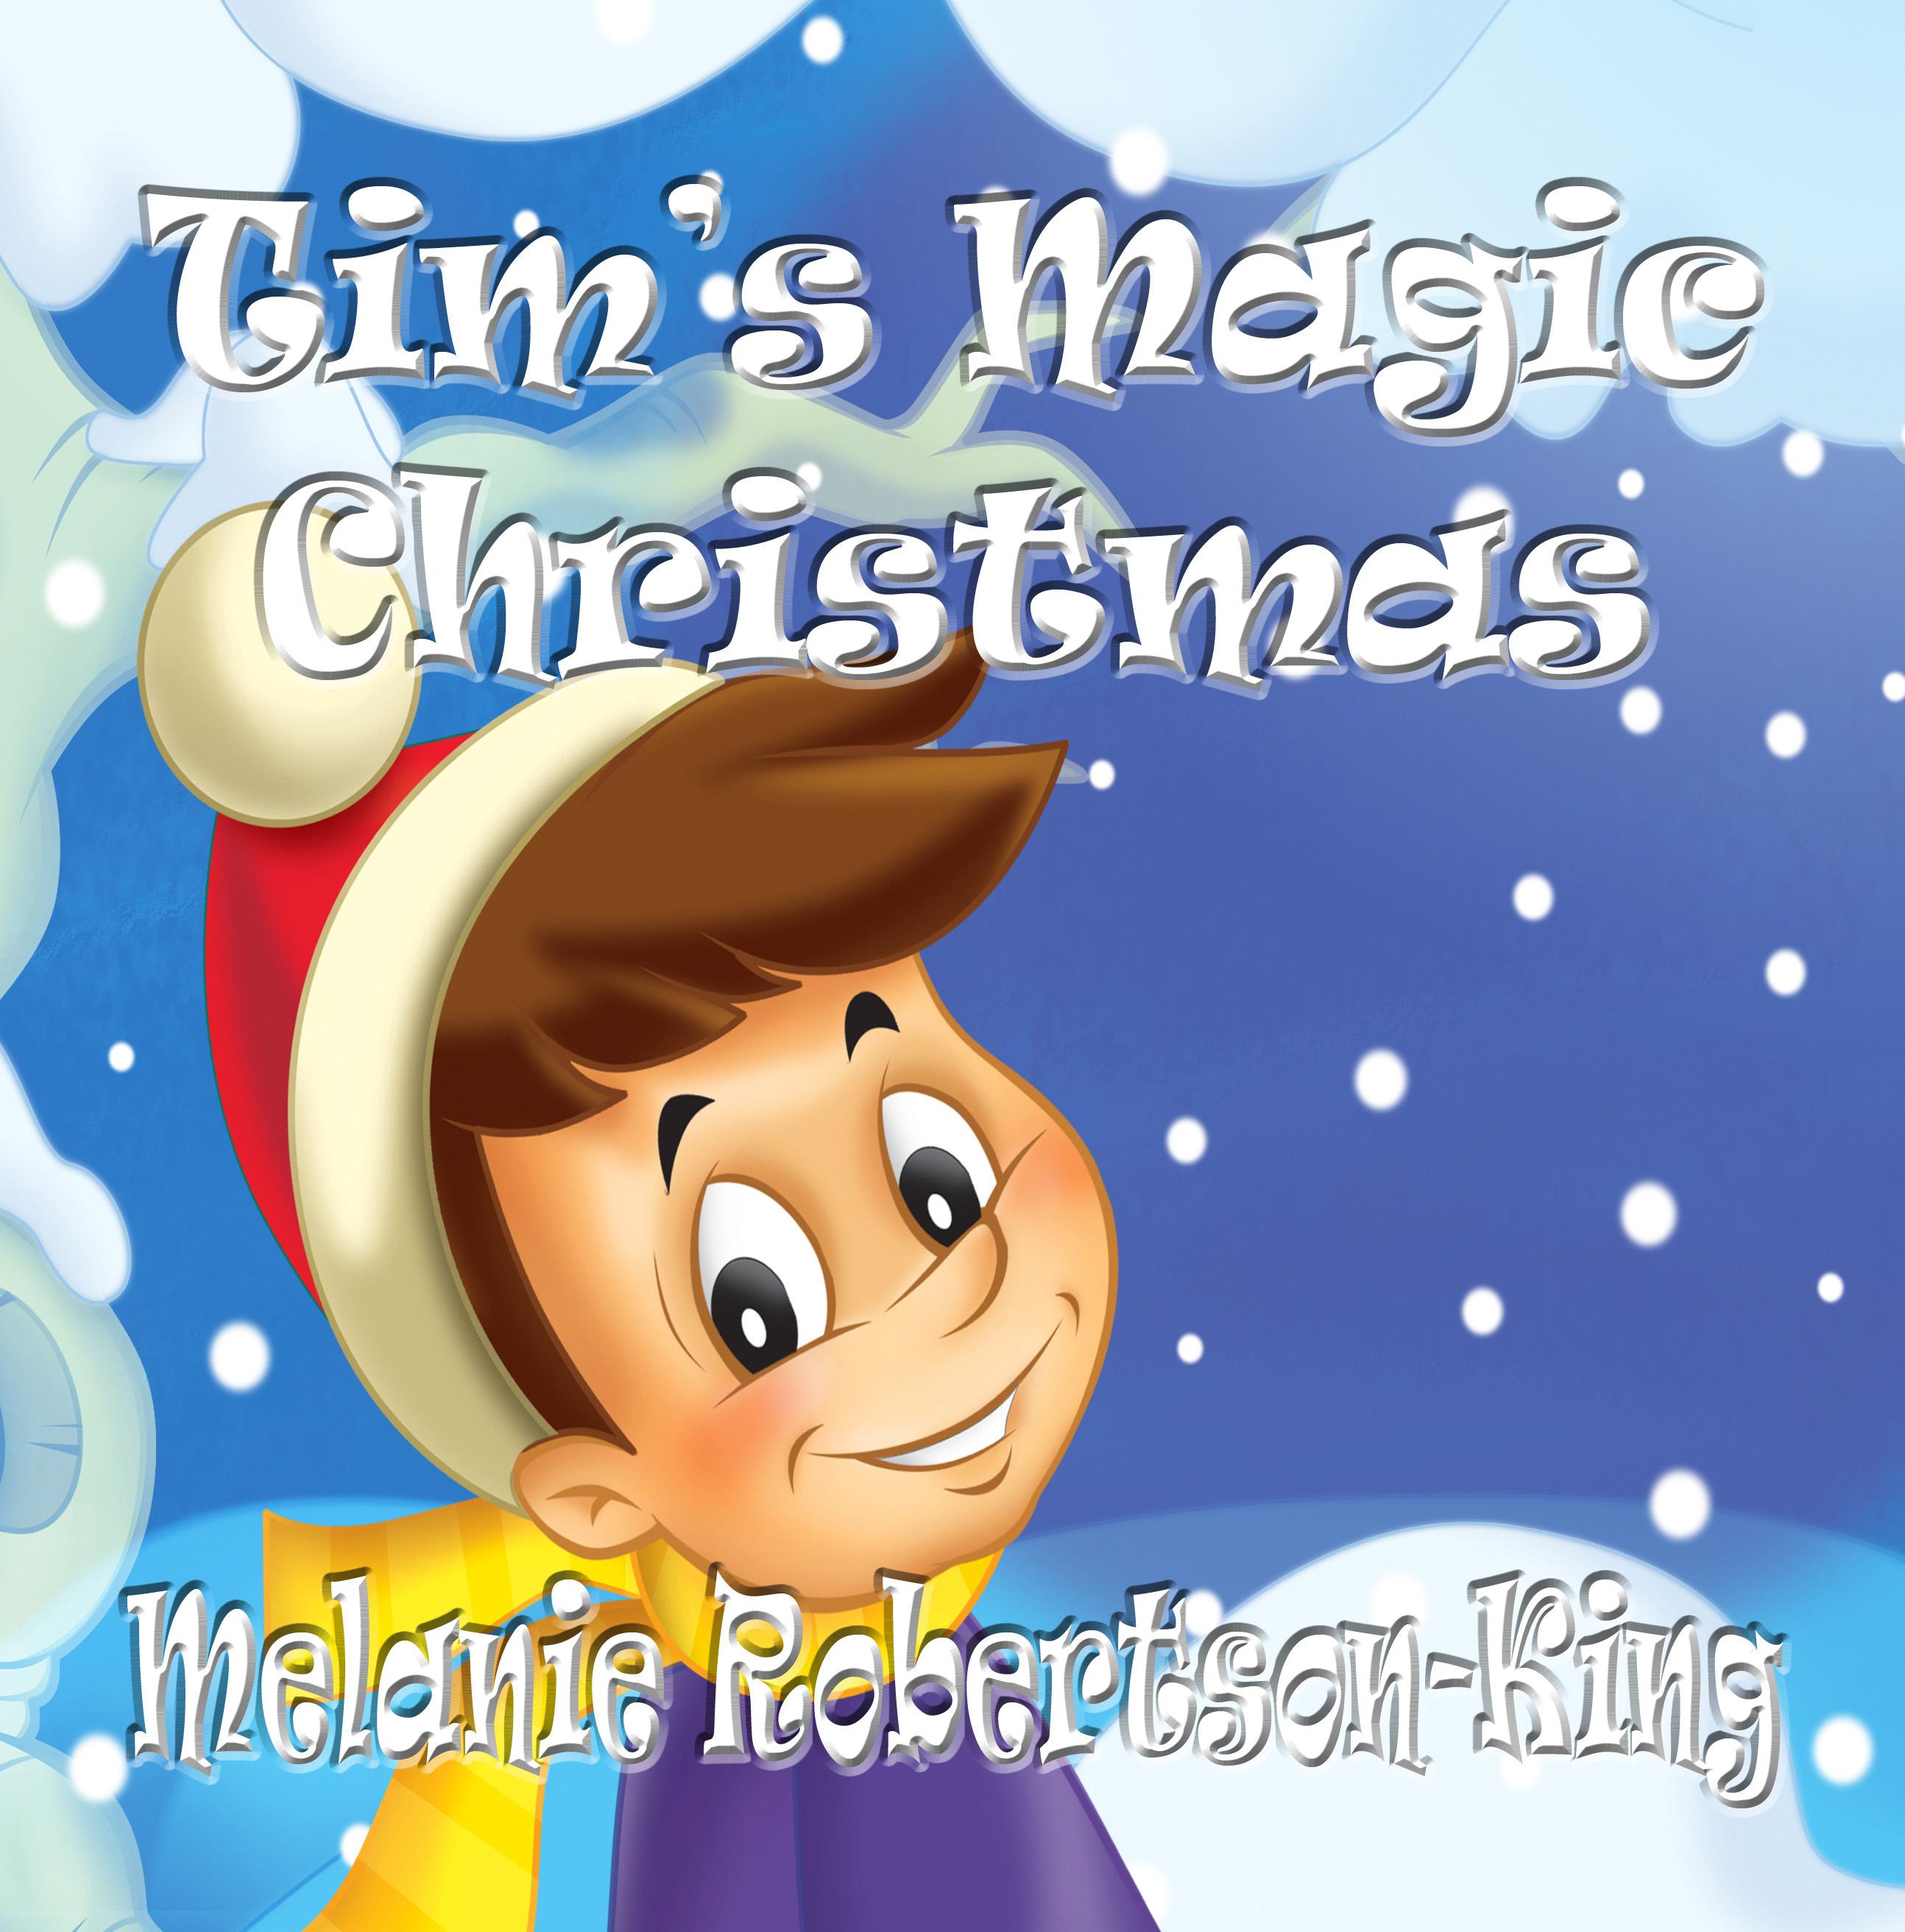 #Christmasinjuly